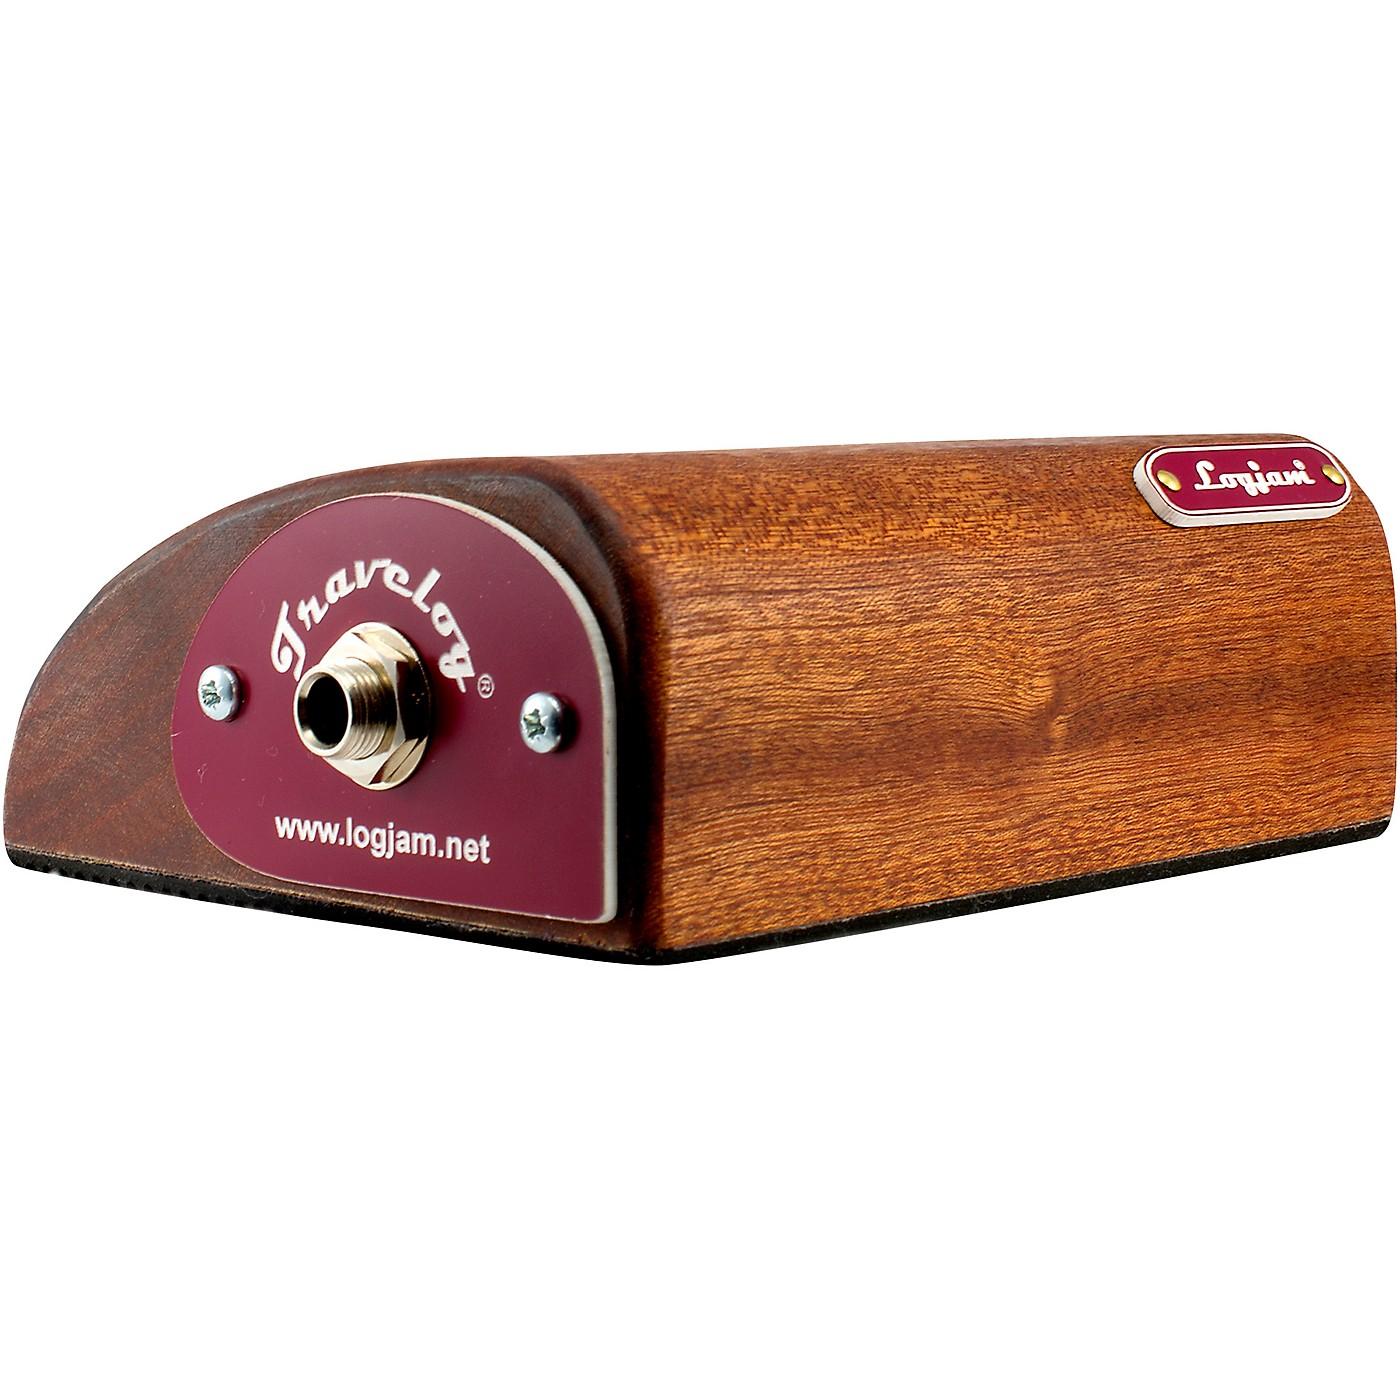 Logjam Bass Drum in a Box Travel Log Stomper thumbnail